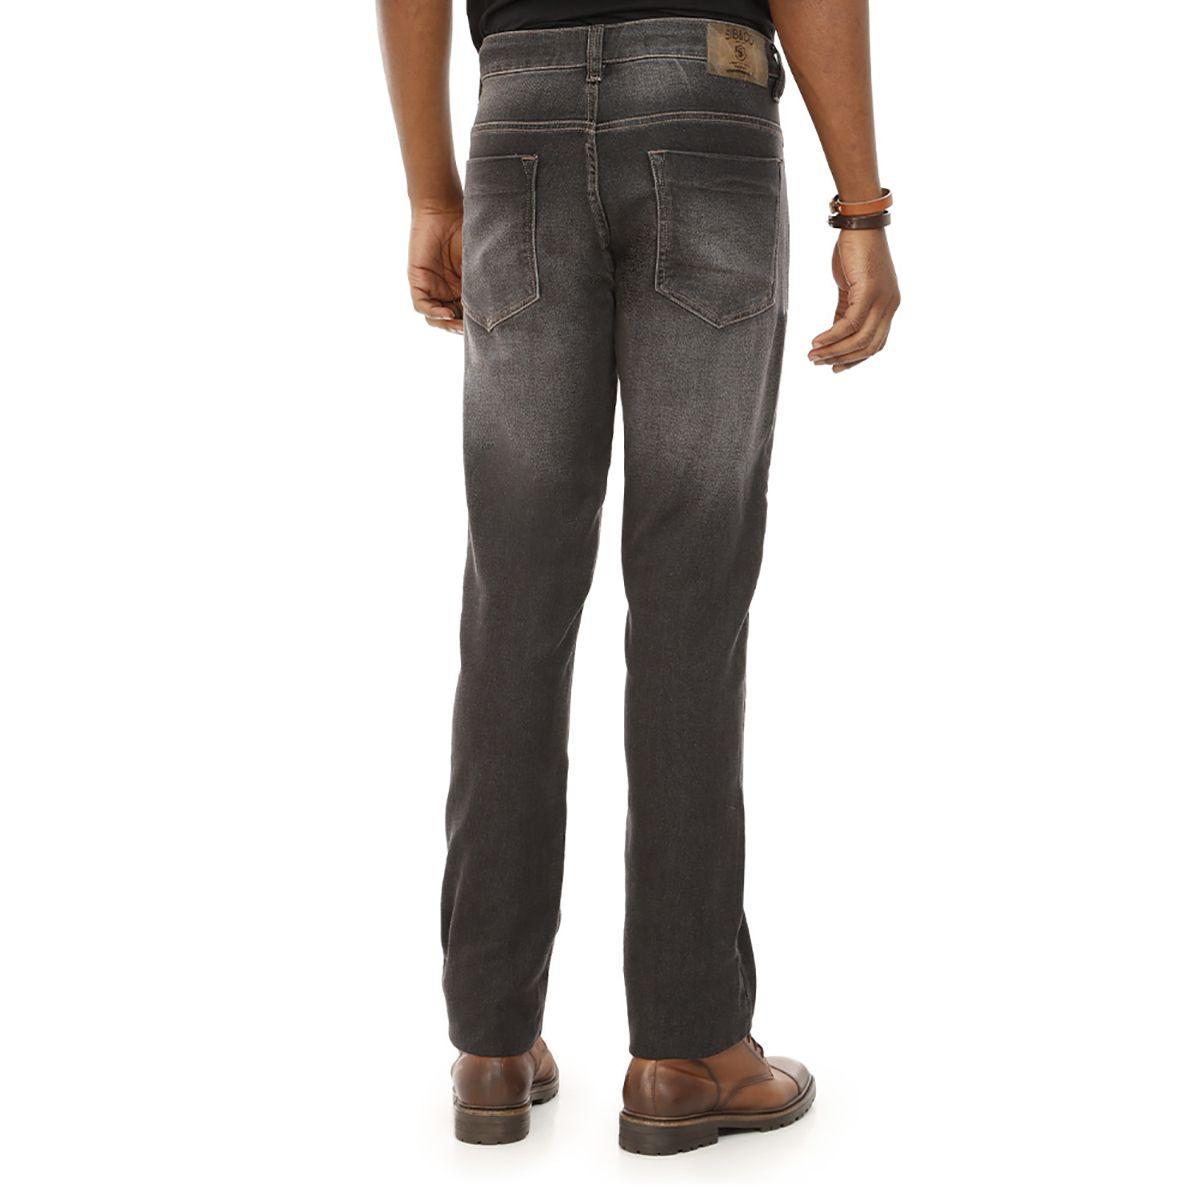 Calca-5-Pockets-Preto---38